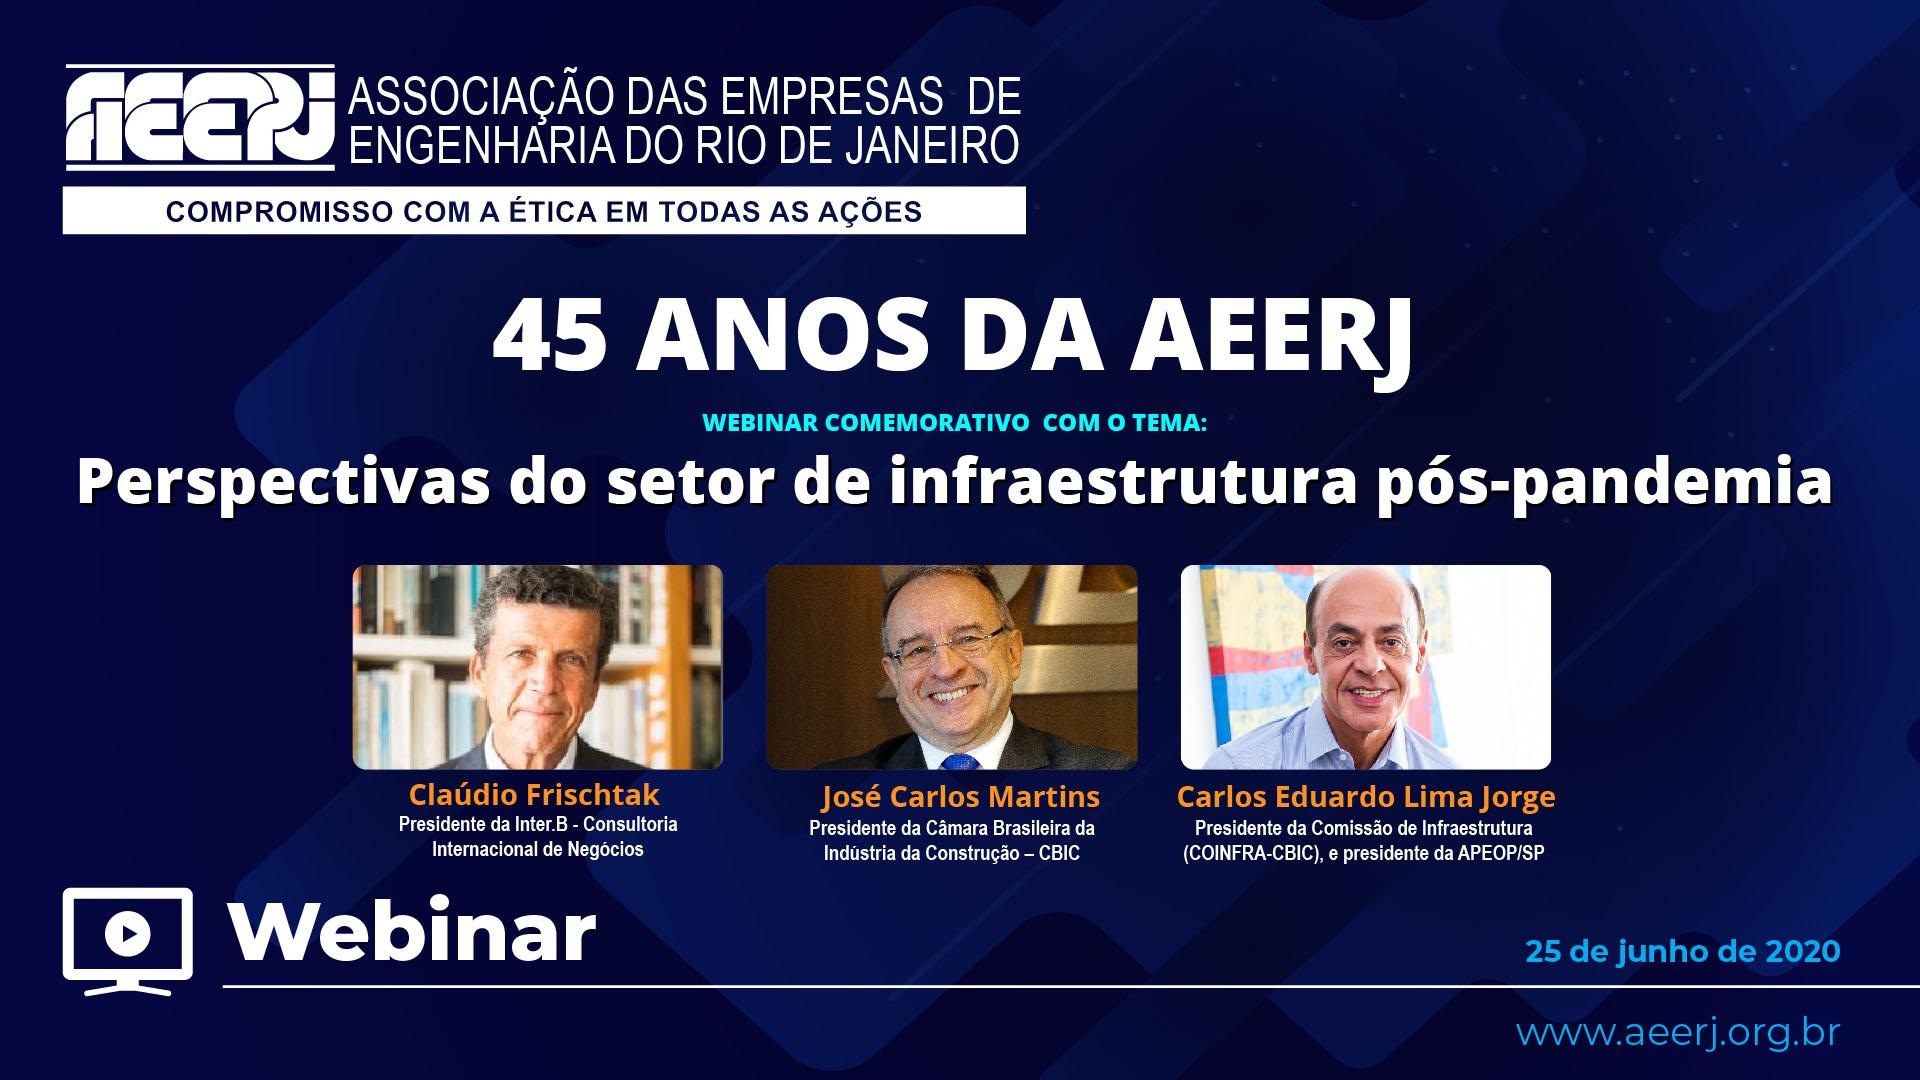 45 anos da AEERJ: Perspectiva do Setor de Infraestrutura Pós-Pandemia